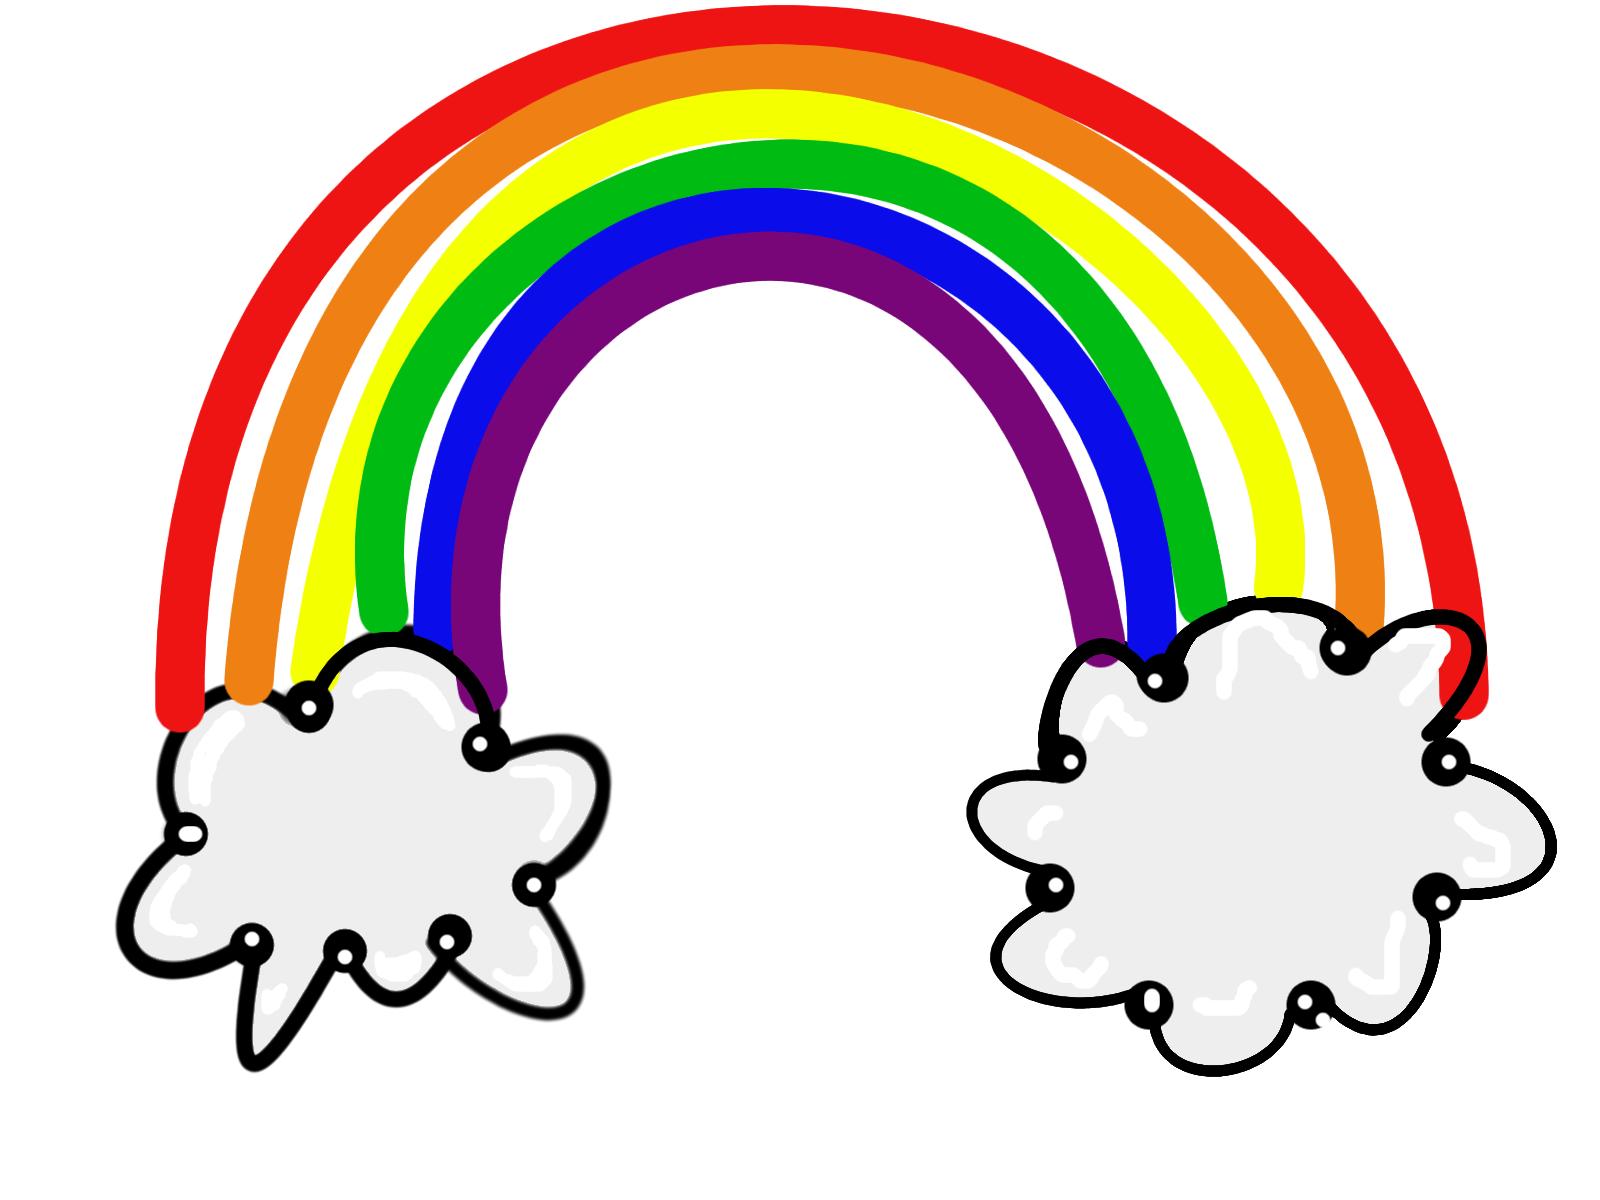 1600x1200 Top 80 Rainbow Clip Art